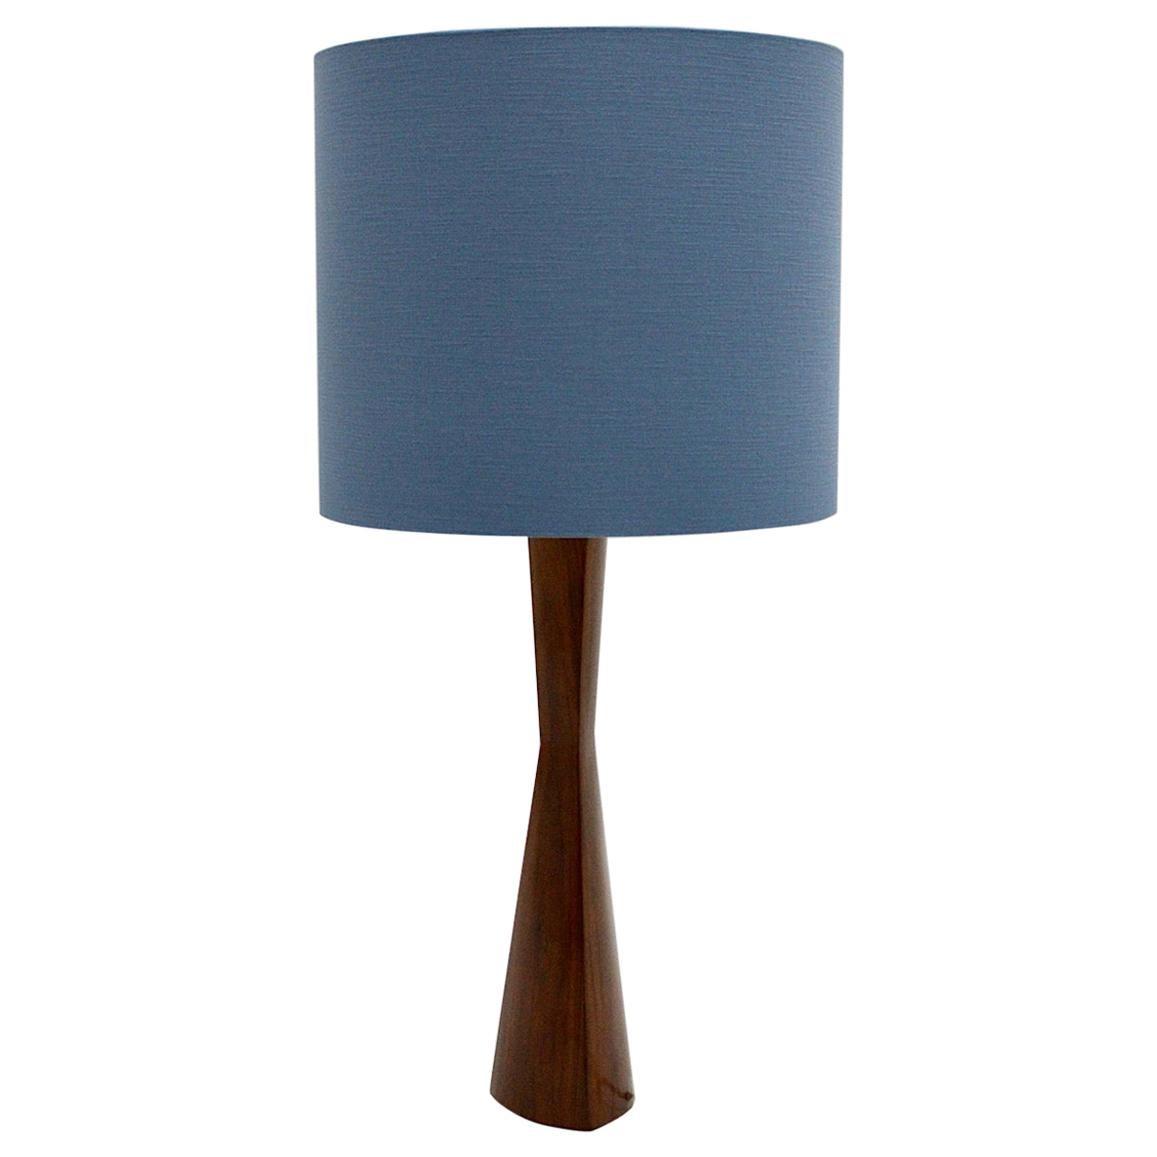 Scandinavian Modern Vintage Teak Table Lamp Blue Lampshade, 1960s, Denmark